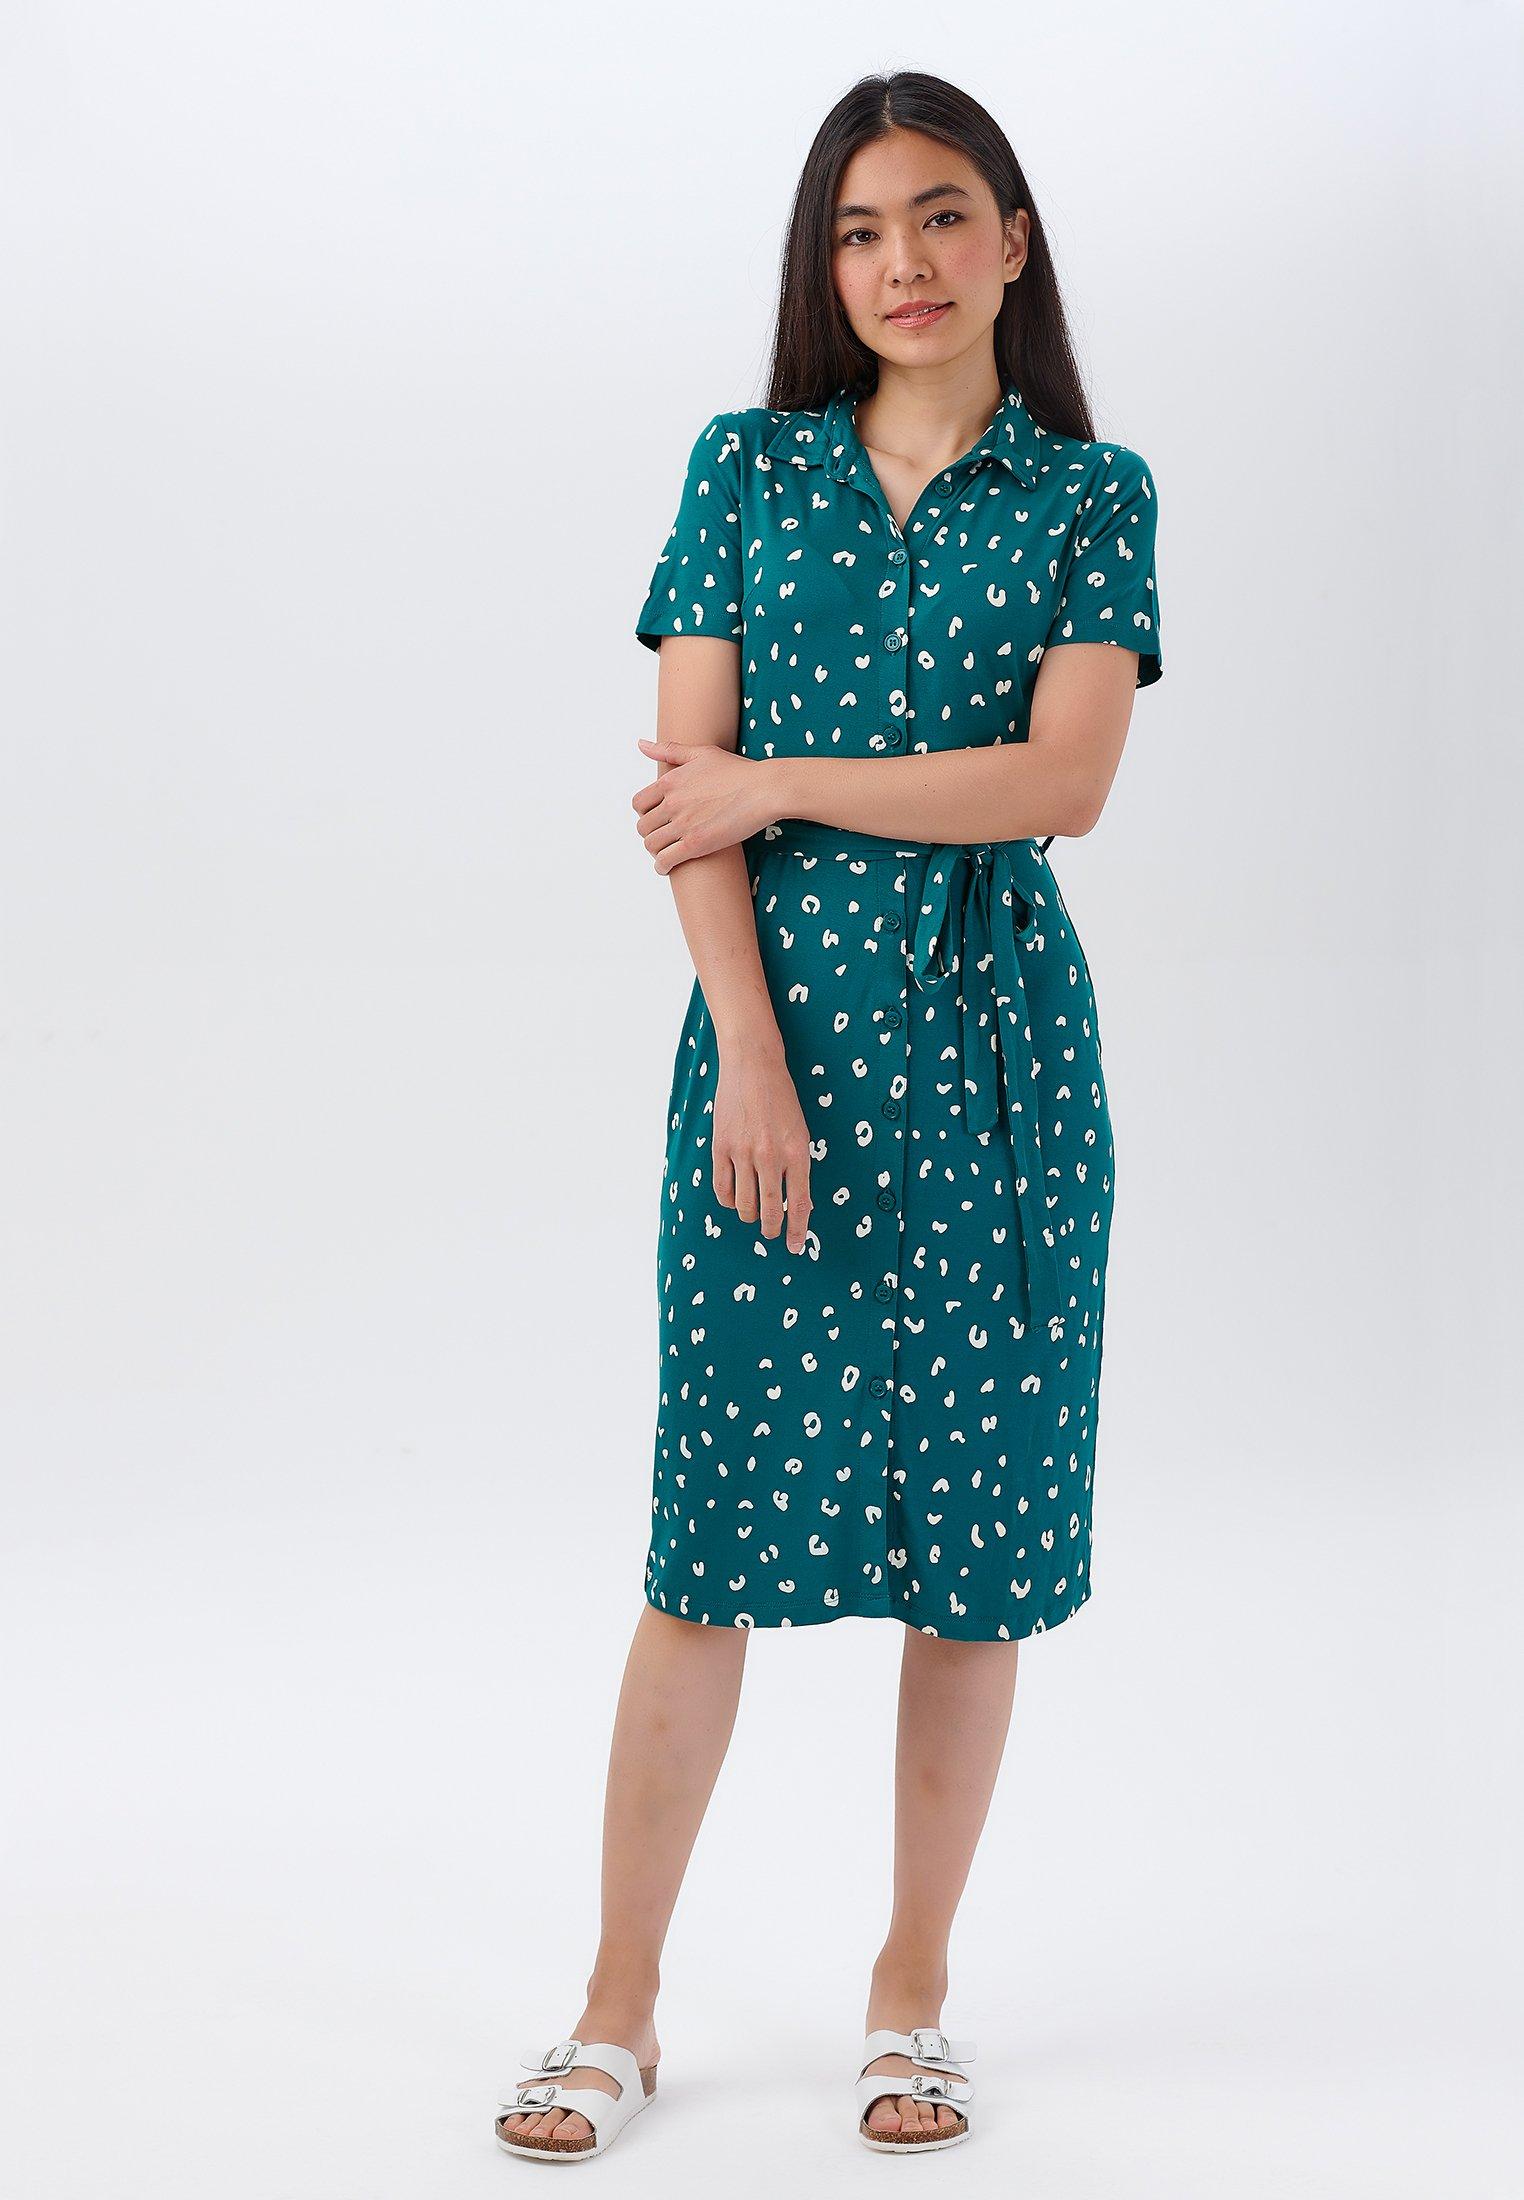 Femme LISA JUNGLE LEOPARD JERSEY - Robe chemise